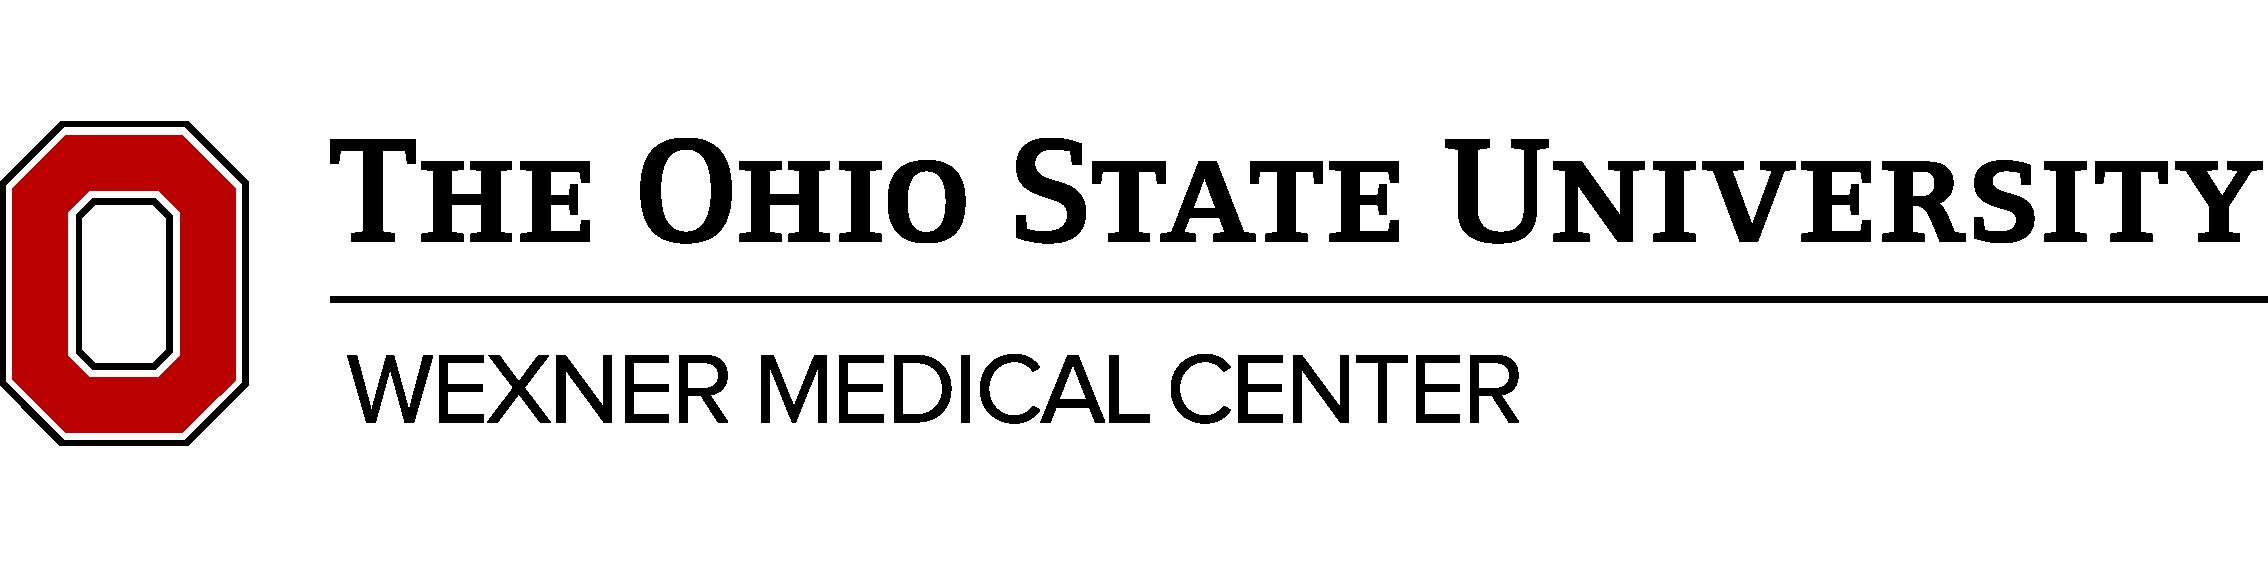 http://www.osteoengineering.com/img/logos/wmc_logo.png